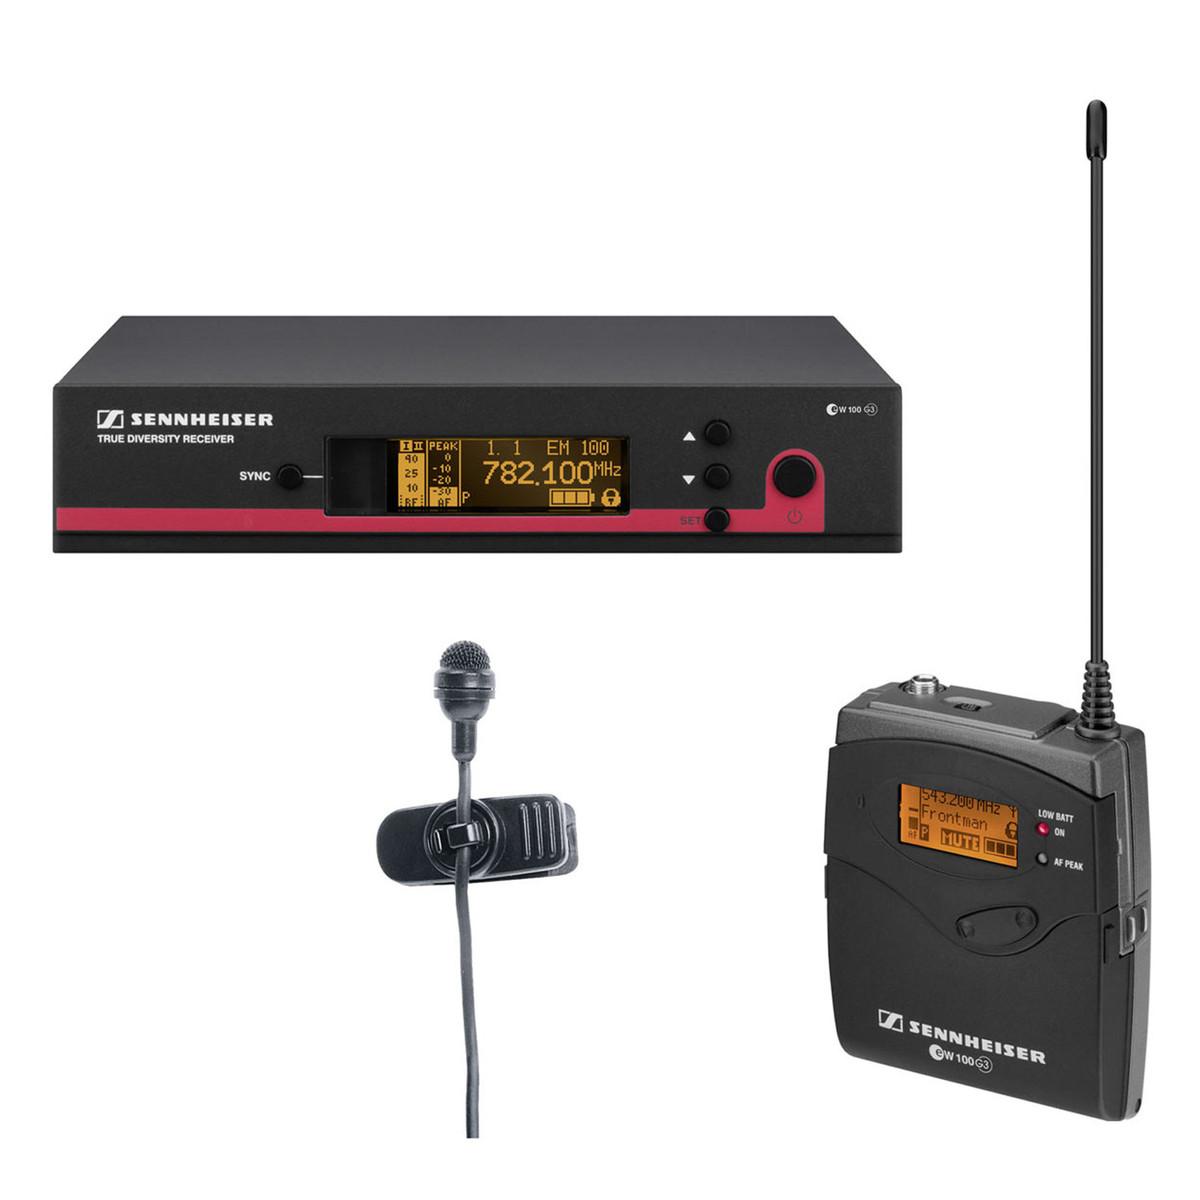 sennheiser ew 122 g3 gb wireless presentation microphone system at. Black Bedroom Furniture Sets. Home Design Ideas